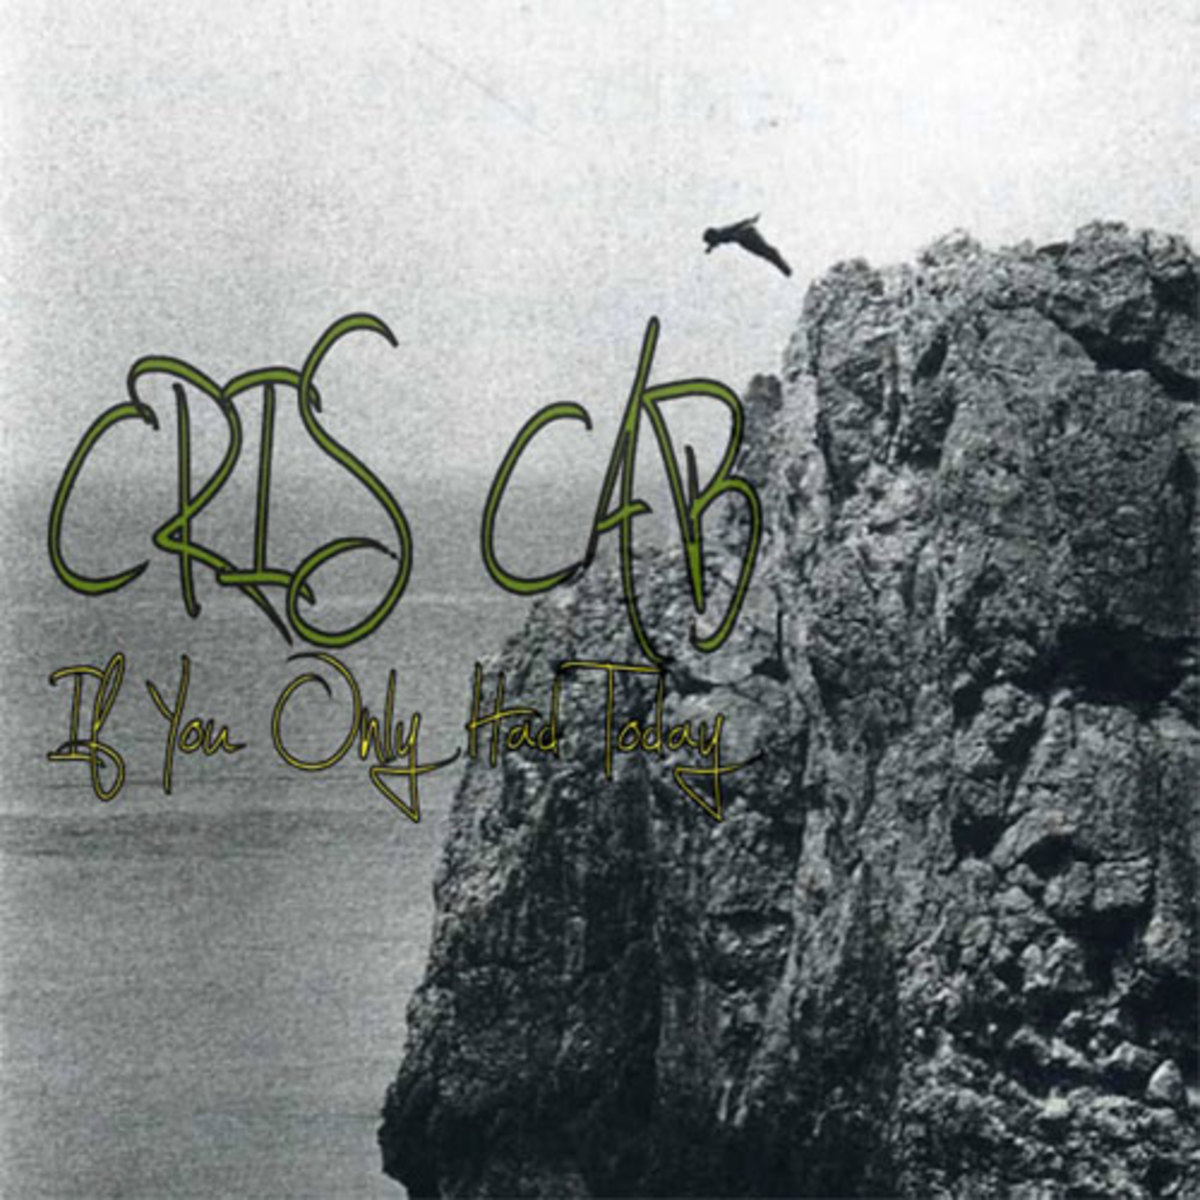 criscab-onlytoday.jpg